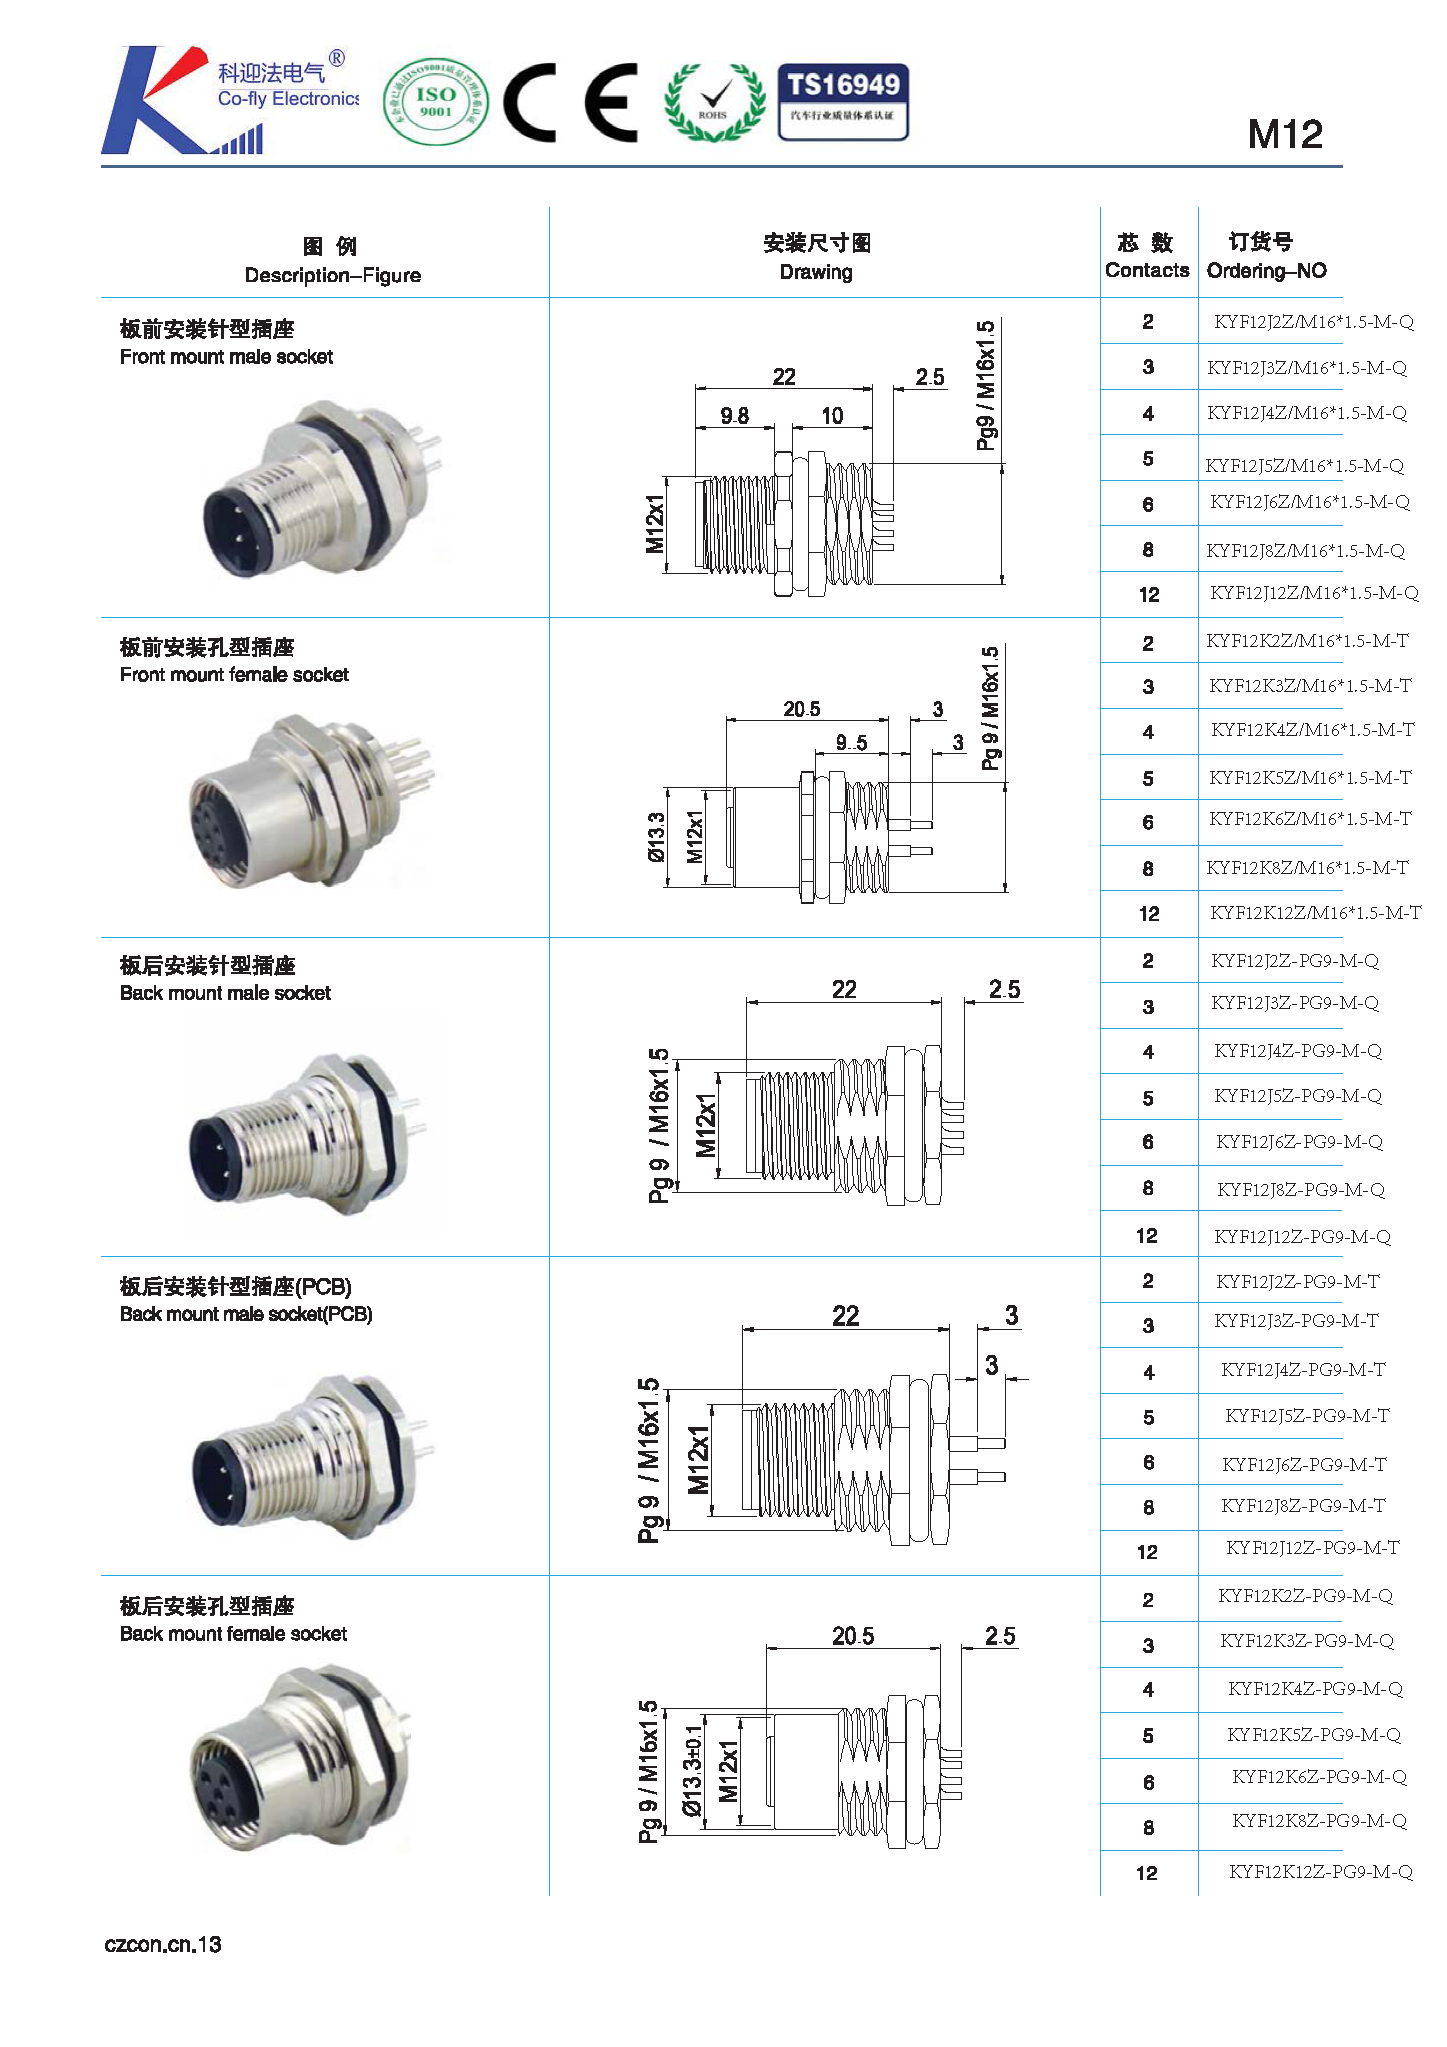 <strong><strong>CC-LINK连接器M12接插件</strong></strong>,用于CC-Link,屏蔽,高防护等级(IP67),a编码,5极兼容BUS M12连接器公头22260135 AB-C5-M12MS-PG9-SH